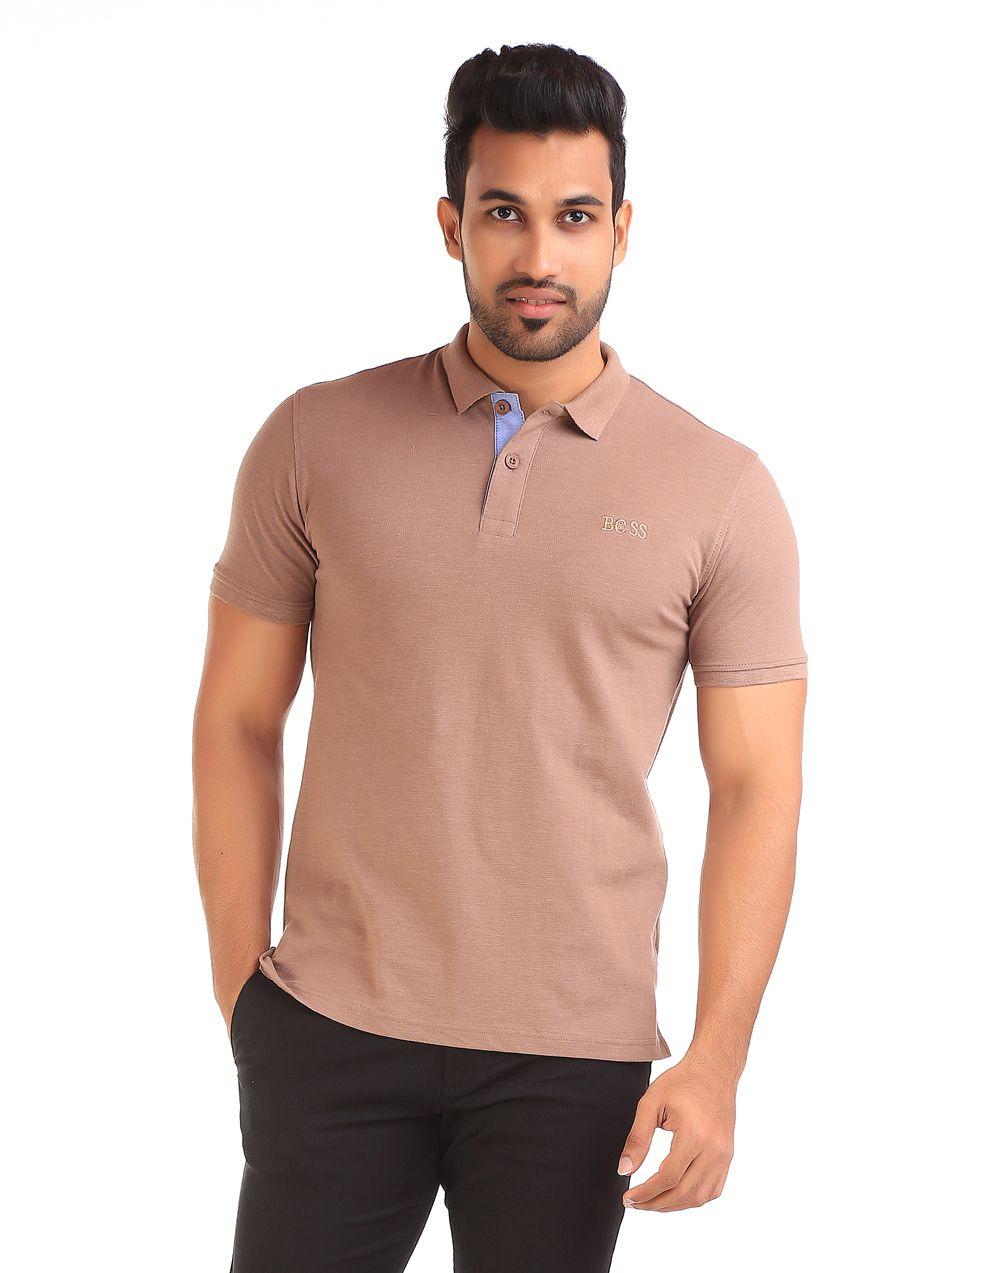 Mens T-shirt | Fashion Bug (Pvt) Ltd. | Mens T-shirt in Sri Lanka